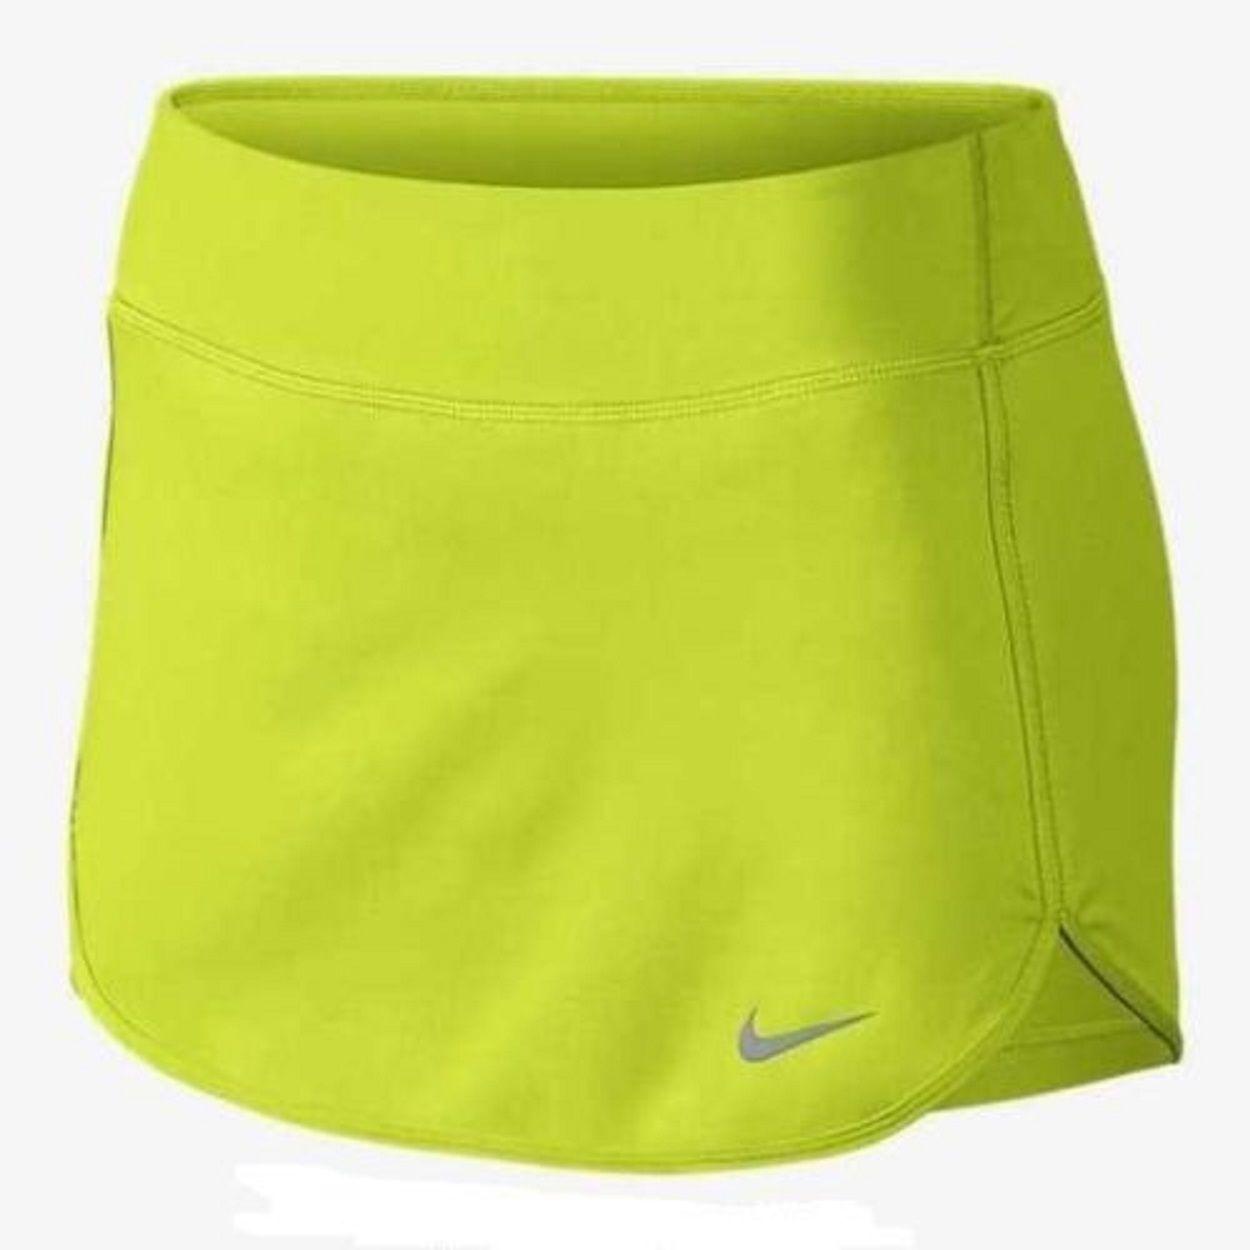 Details About Nwt Nike Women S Drifit Straight Court Knit Tennis Skirt Cyberlime 646167 382 Tennis Skort Nike Women Tennis Skirt